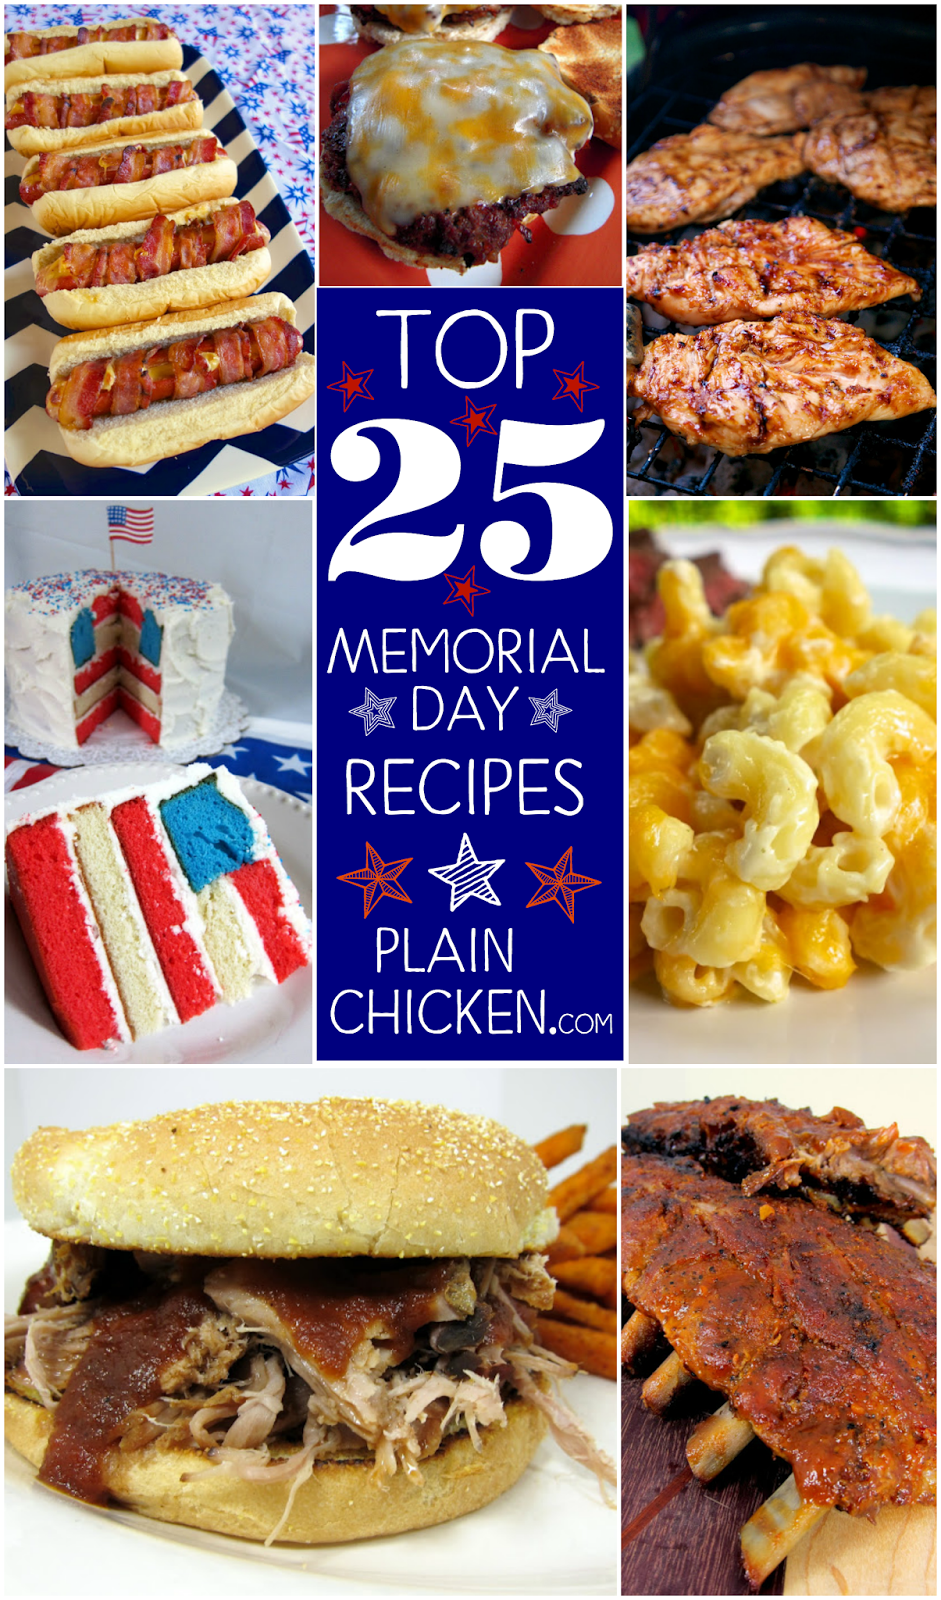 Top 25 Best Kylie Jenner Lip Kit Ideas On Pinterest: Top 25 Memorial Day Recipes